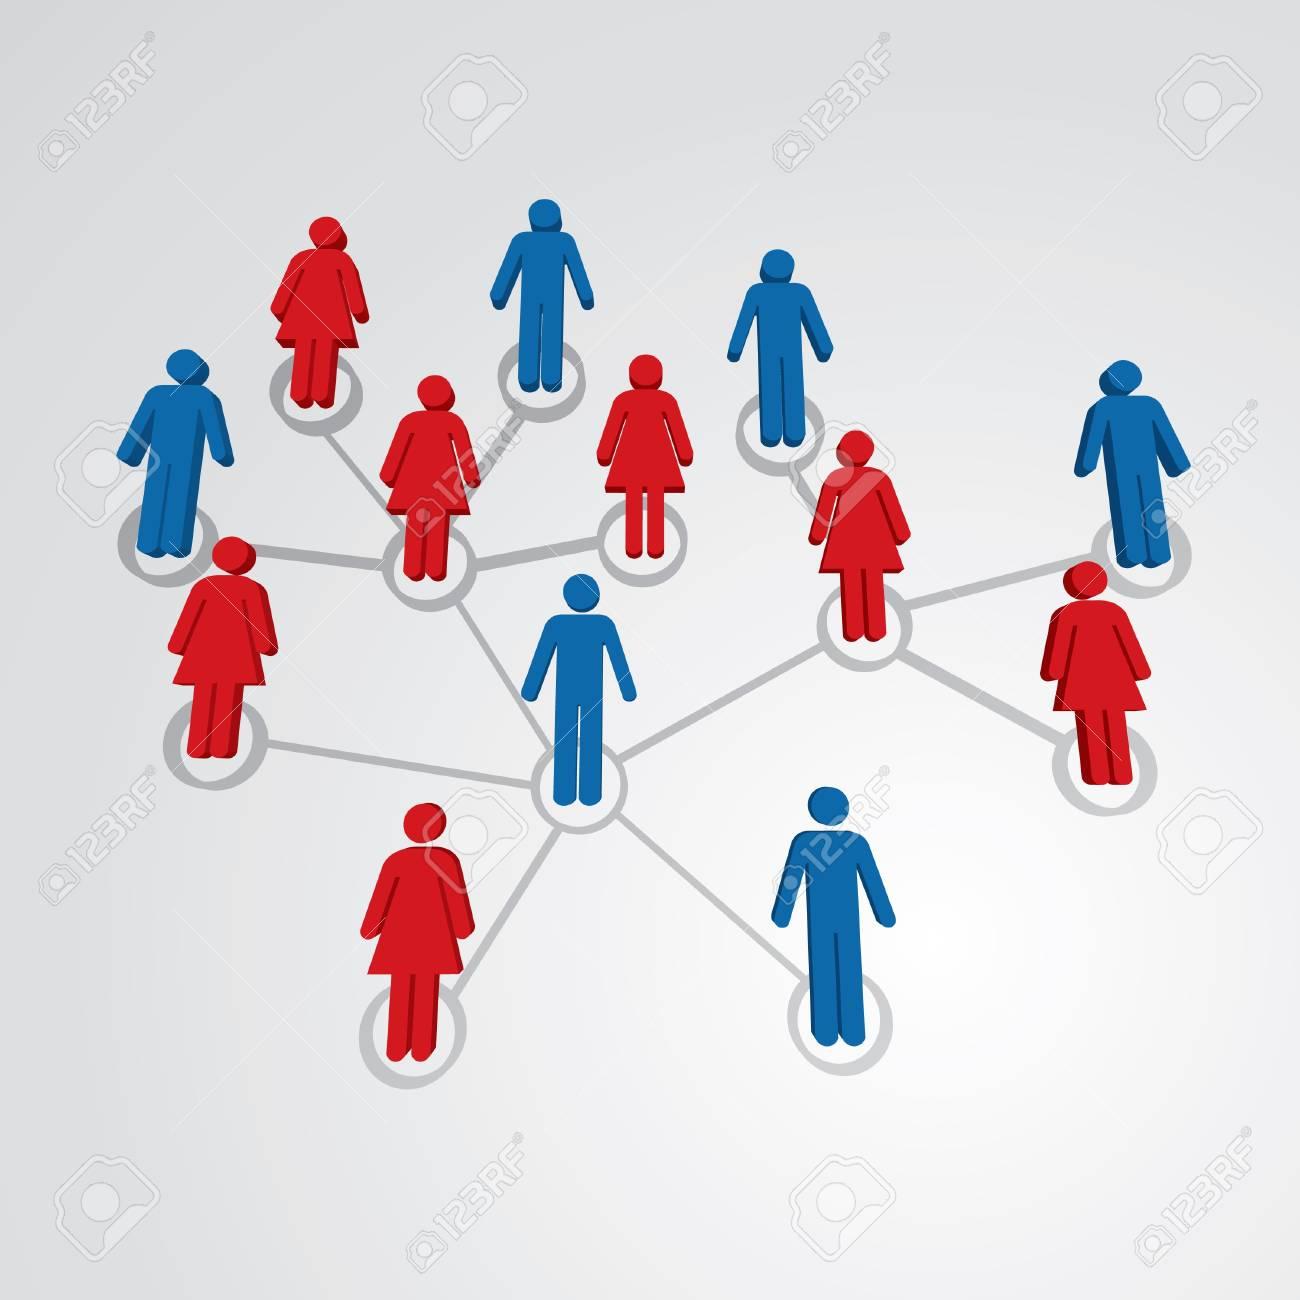 Men and women in social network map - illustration Stock Vector - 12861018